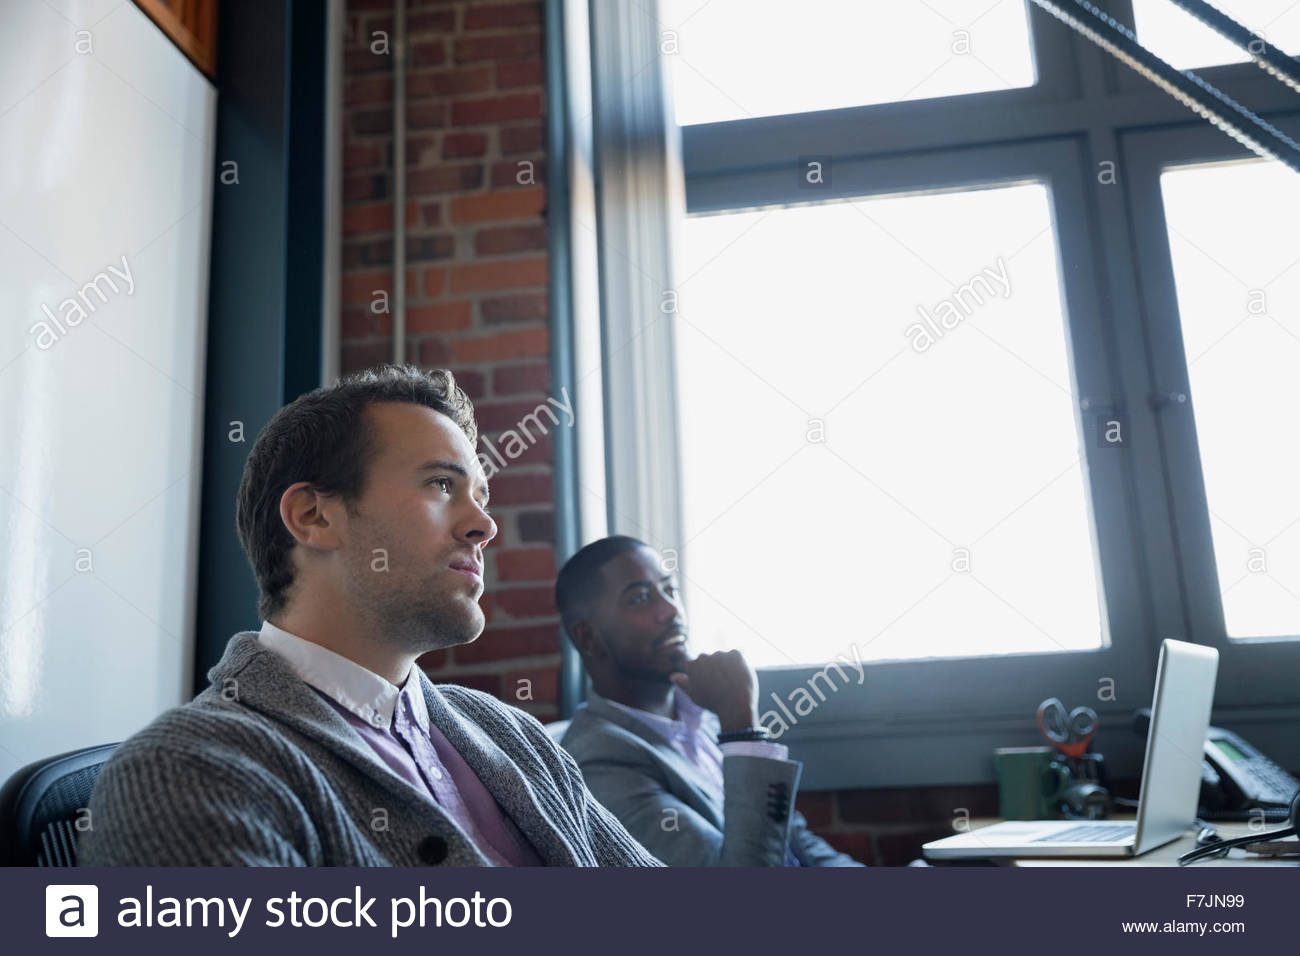 Businessmen in meeting - Stock Image